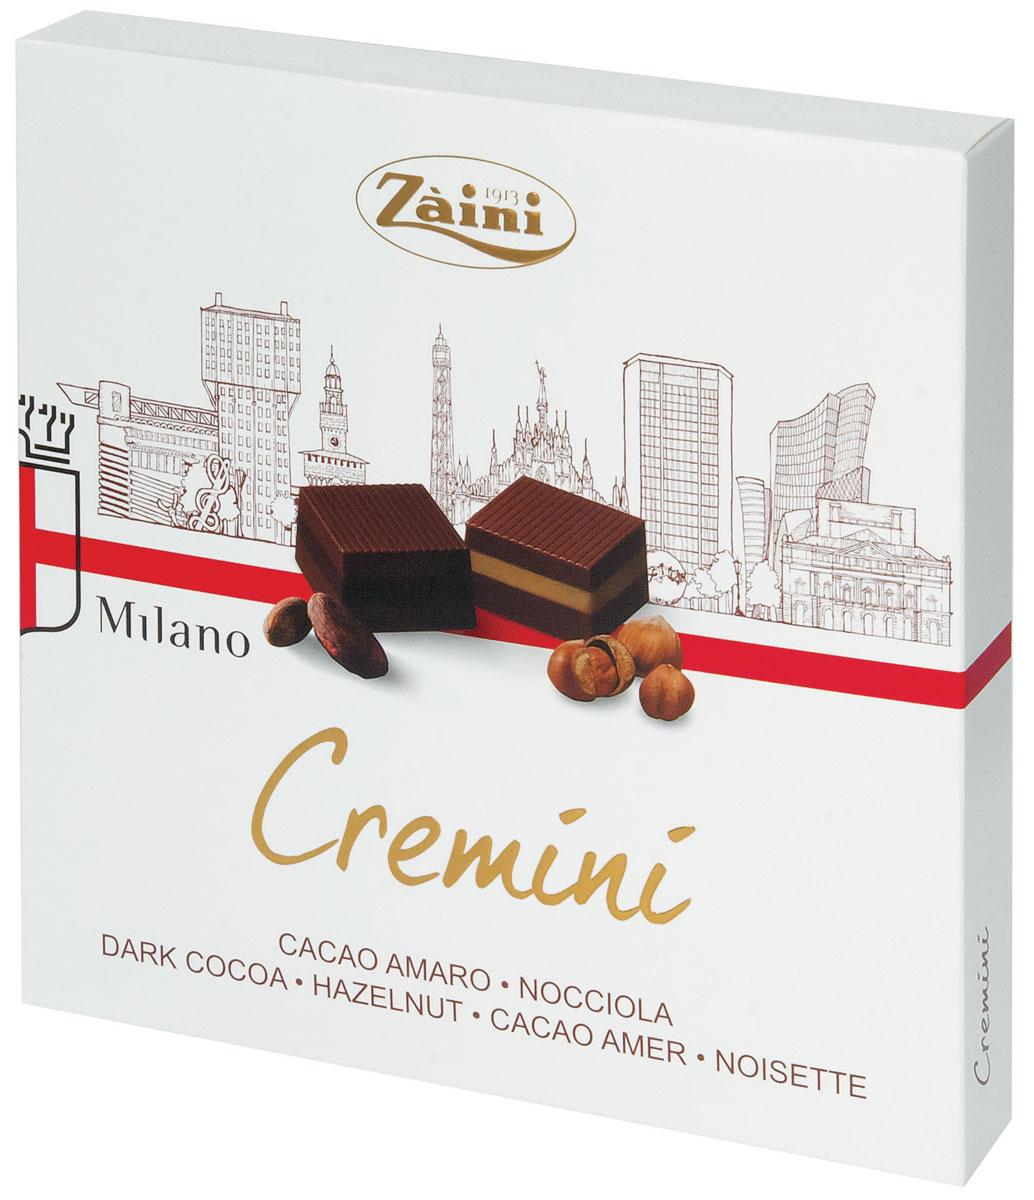 Zain Milanoi Cremini Gift Box набор шоколадных конфет, 240 г3132Zain Milanoi Cremini - Шоколадные конфеты, изготовленные на основе шоколадно-ореховой пасты, сливок и жареного фундука.